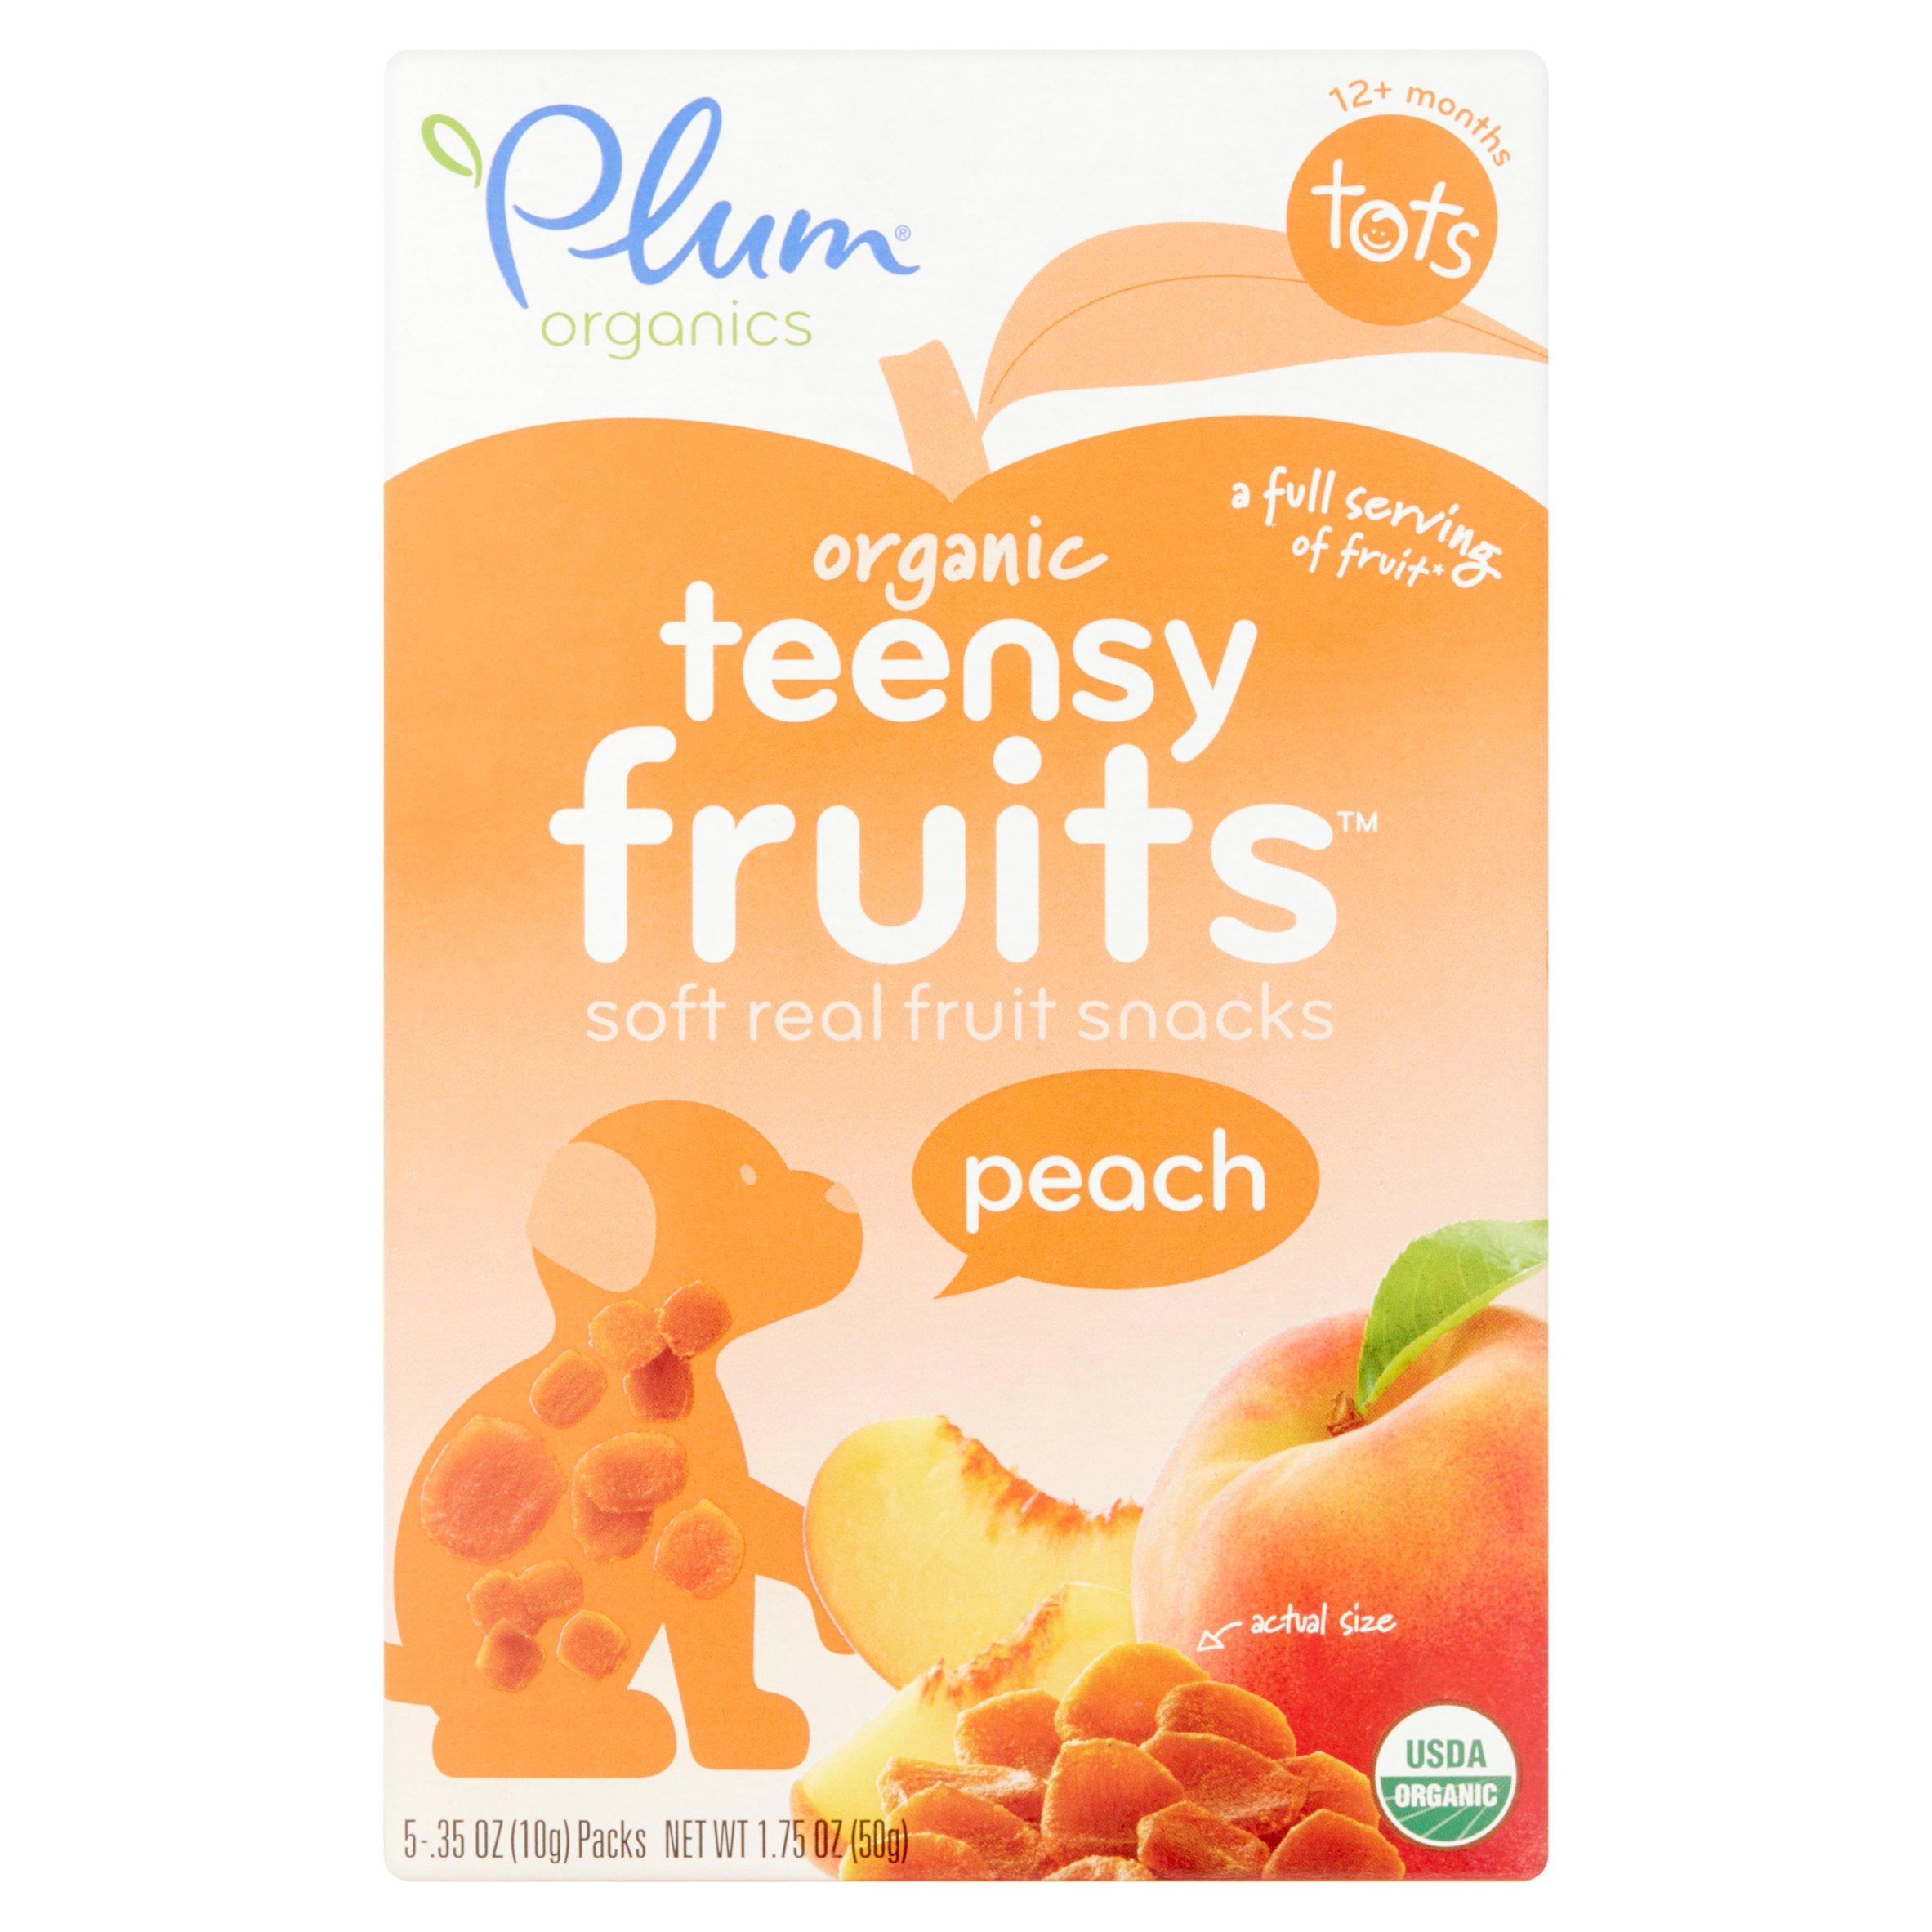 Plum Organics Teensy Fruits Peach Soft Real Fruit Snacks Tots 12+ Months, 5 count, .35 oz, 8 pack